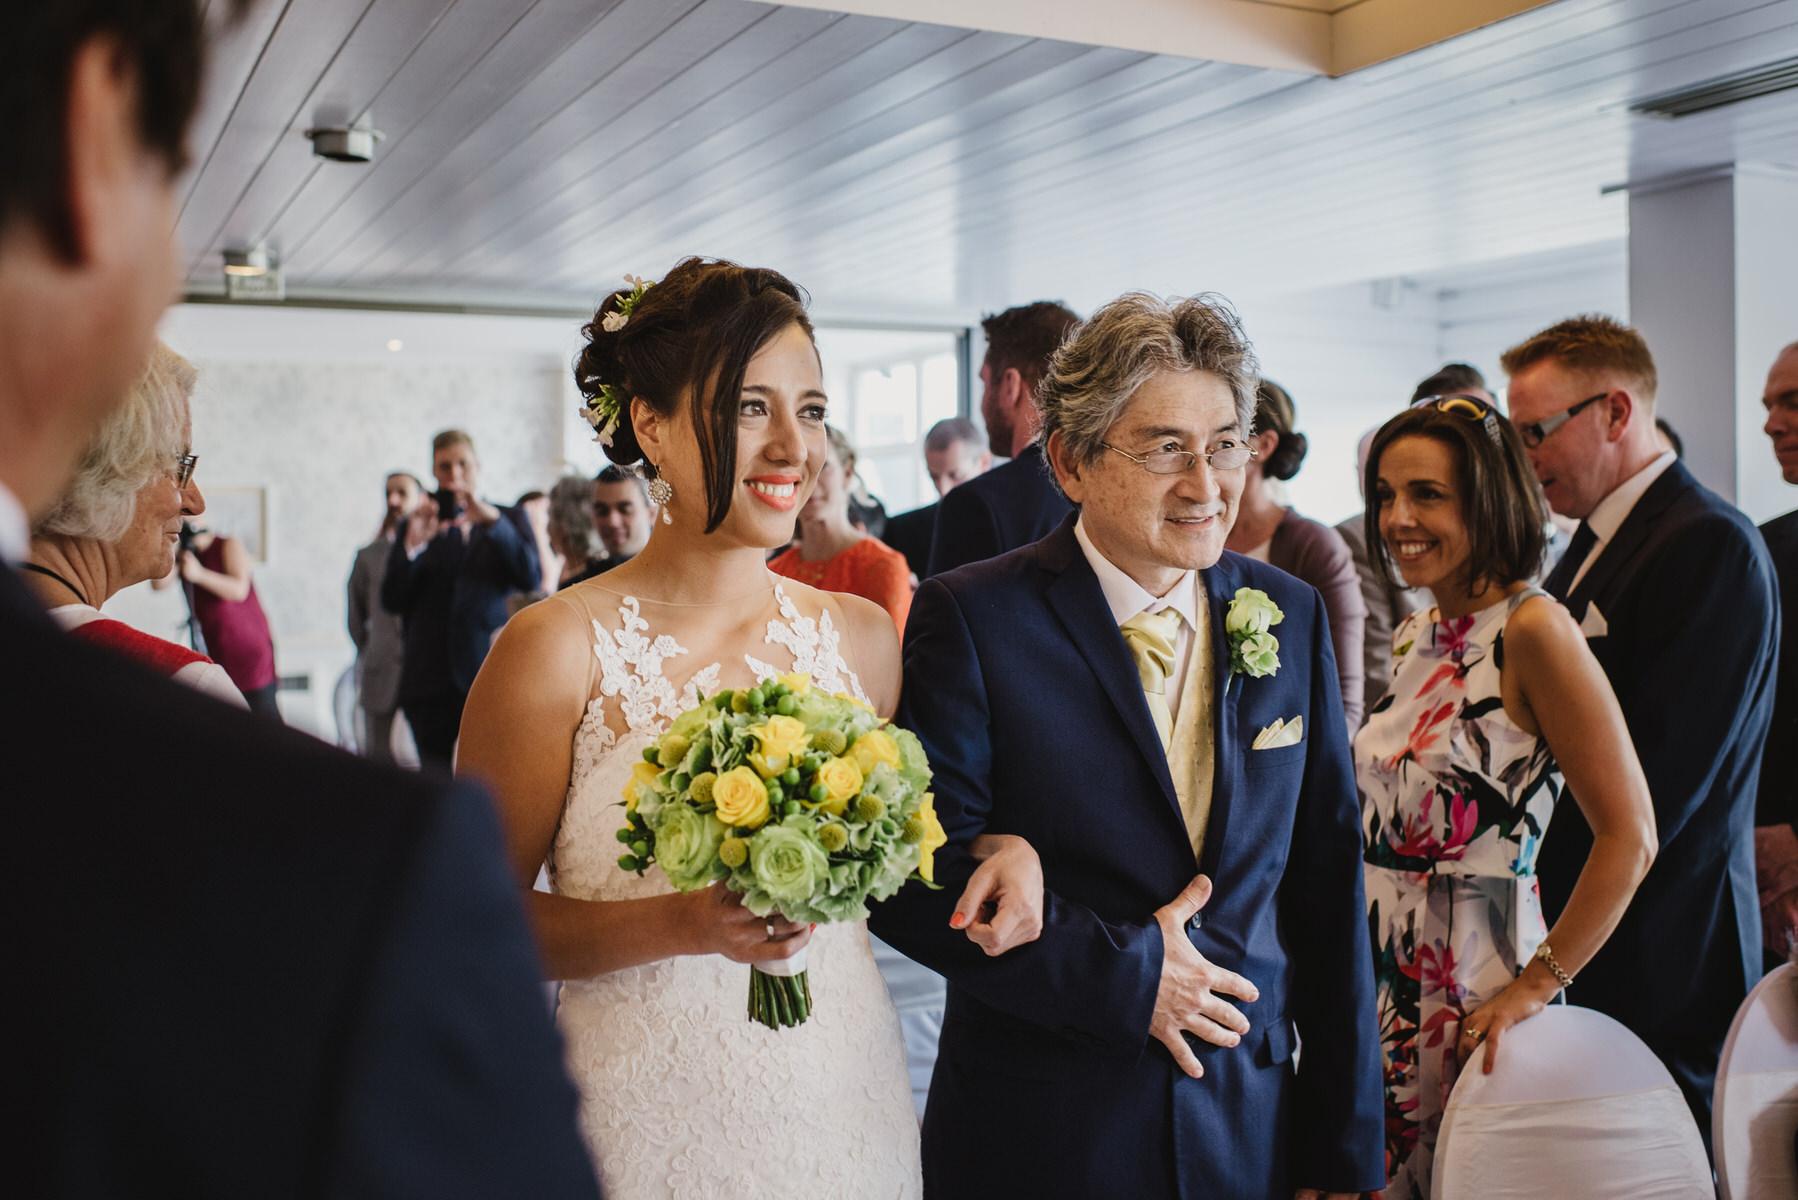 Ravens Ait wedding bride arriving